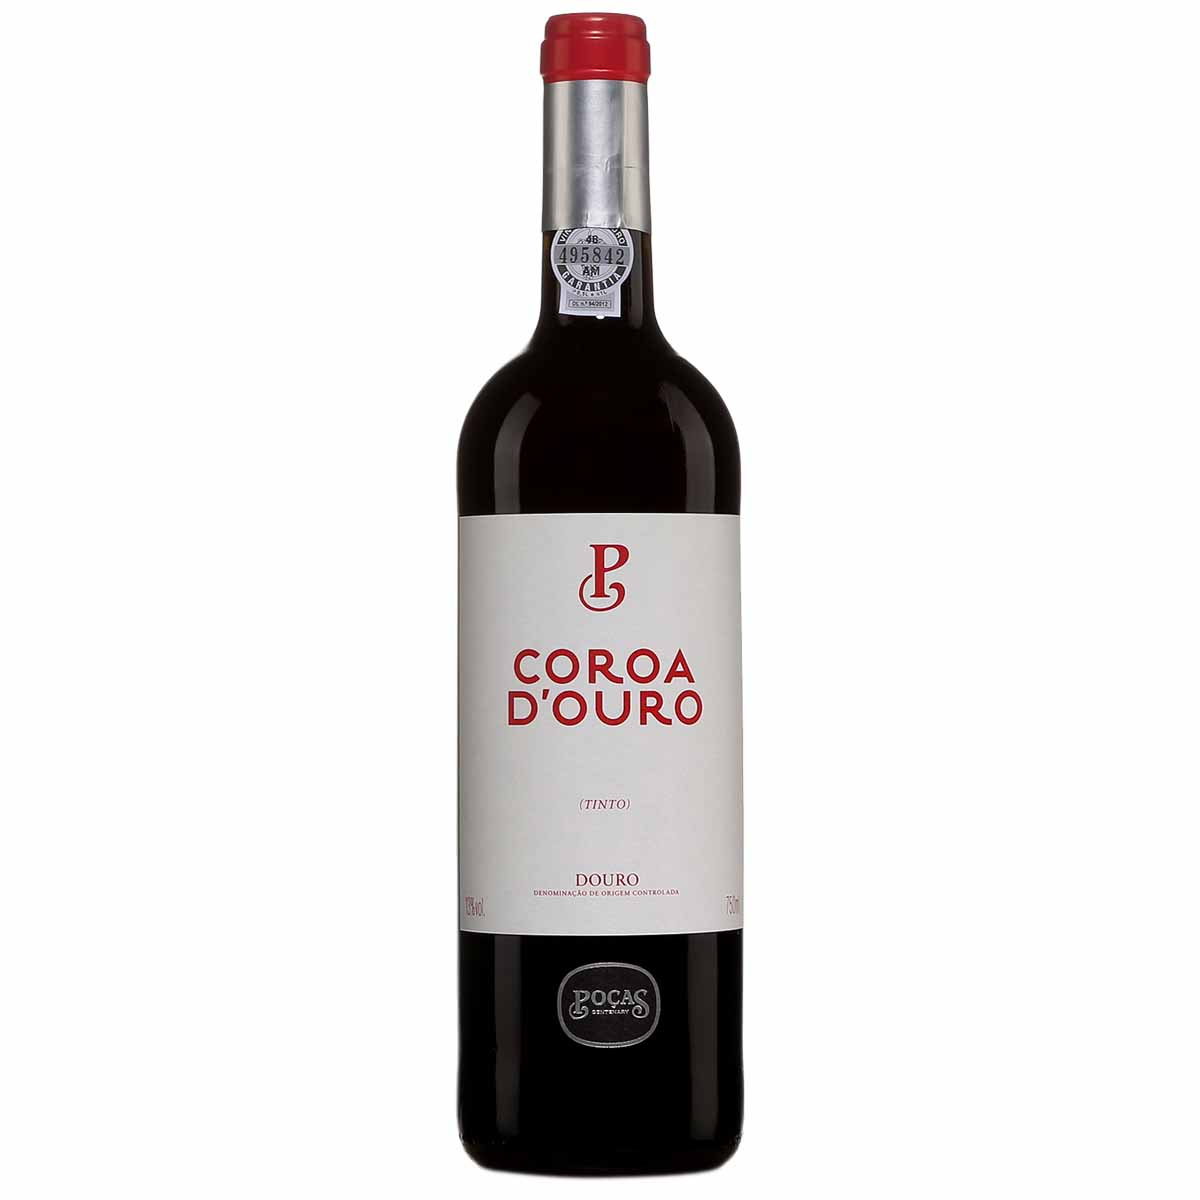 Vinho Tinto Português Coroa D'ouro Douro DOC 2017 750ml